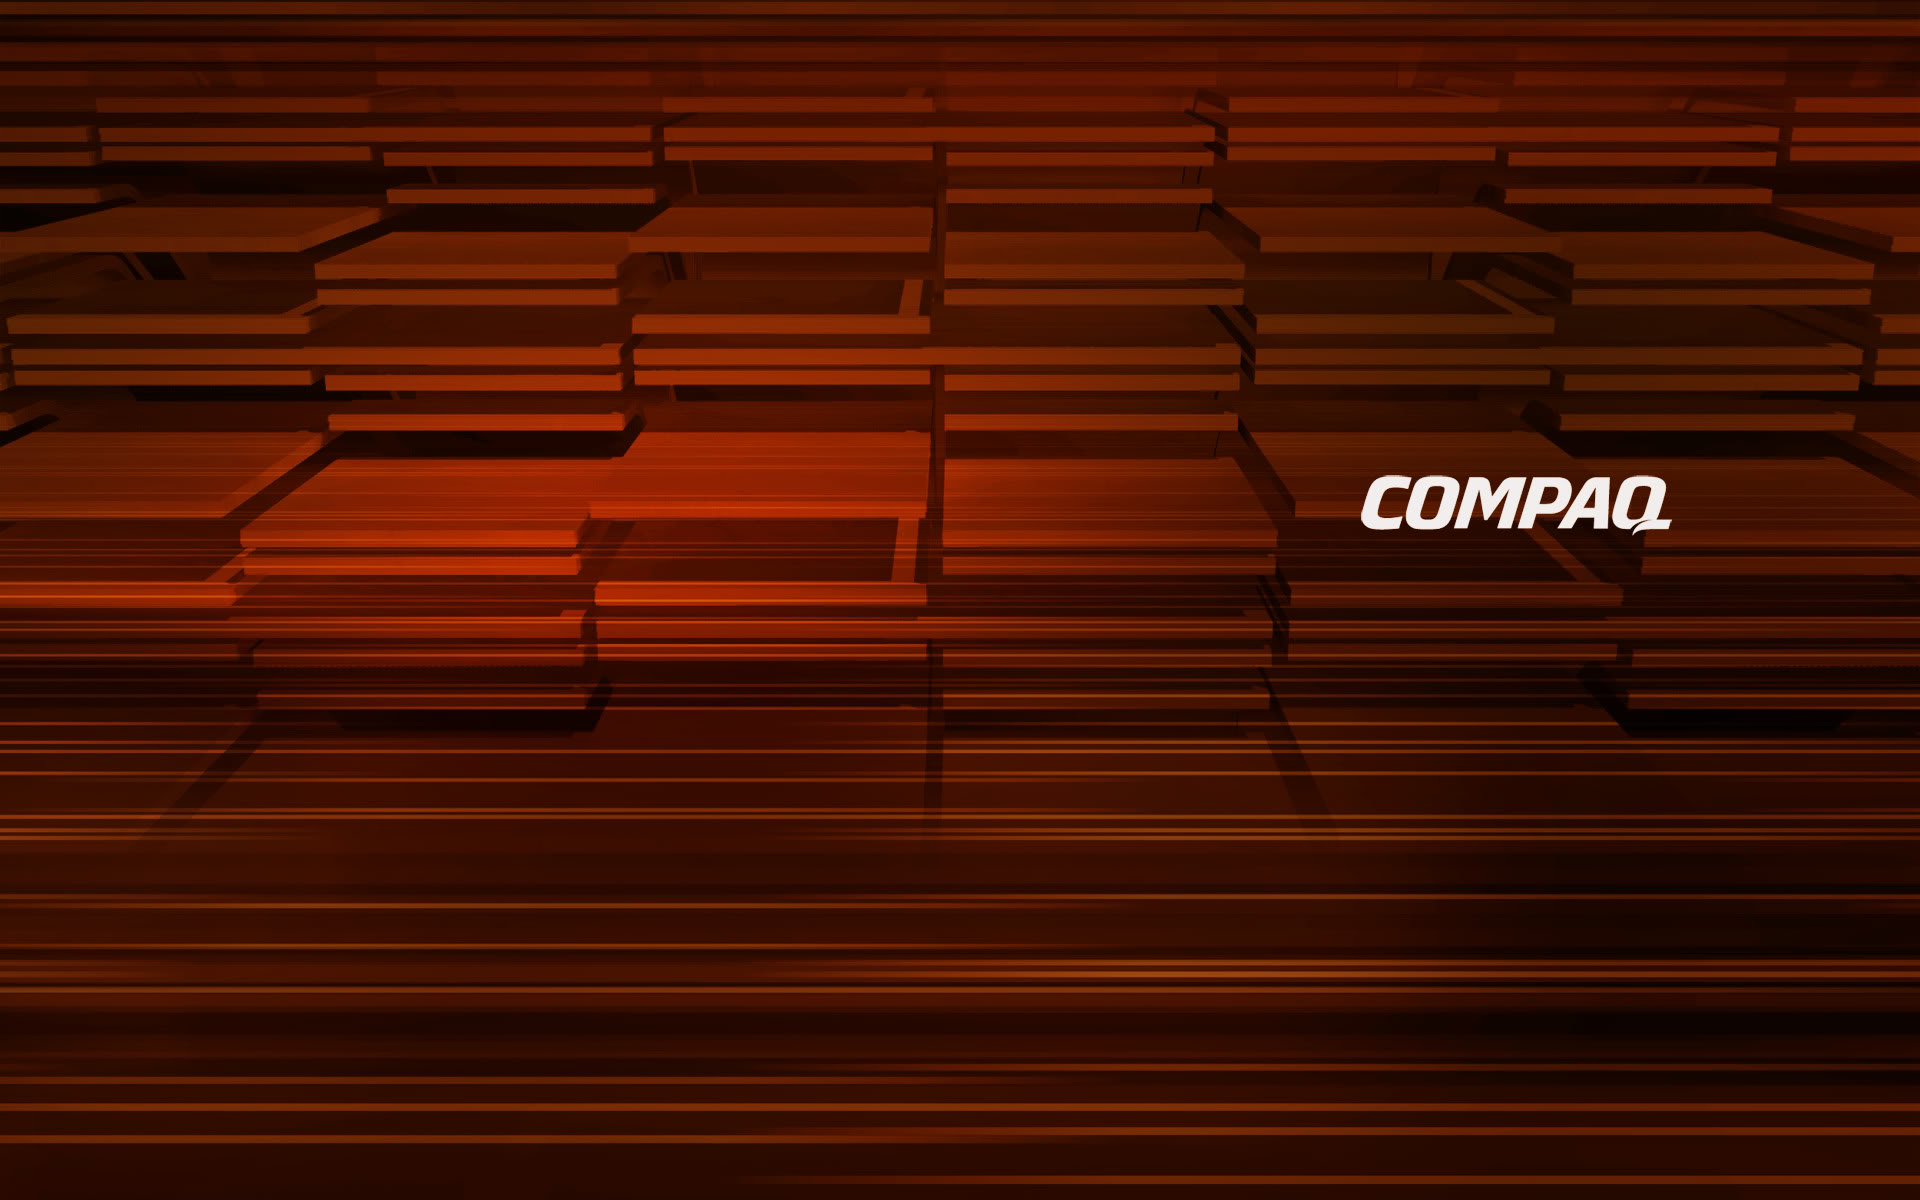 Free Compaq Wallpaper